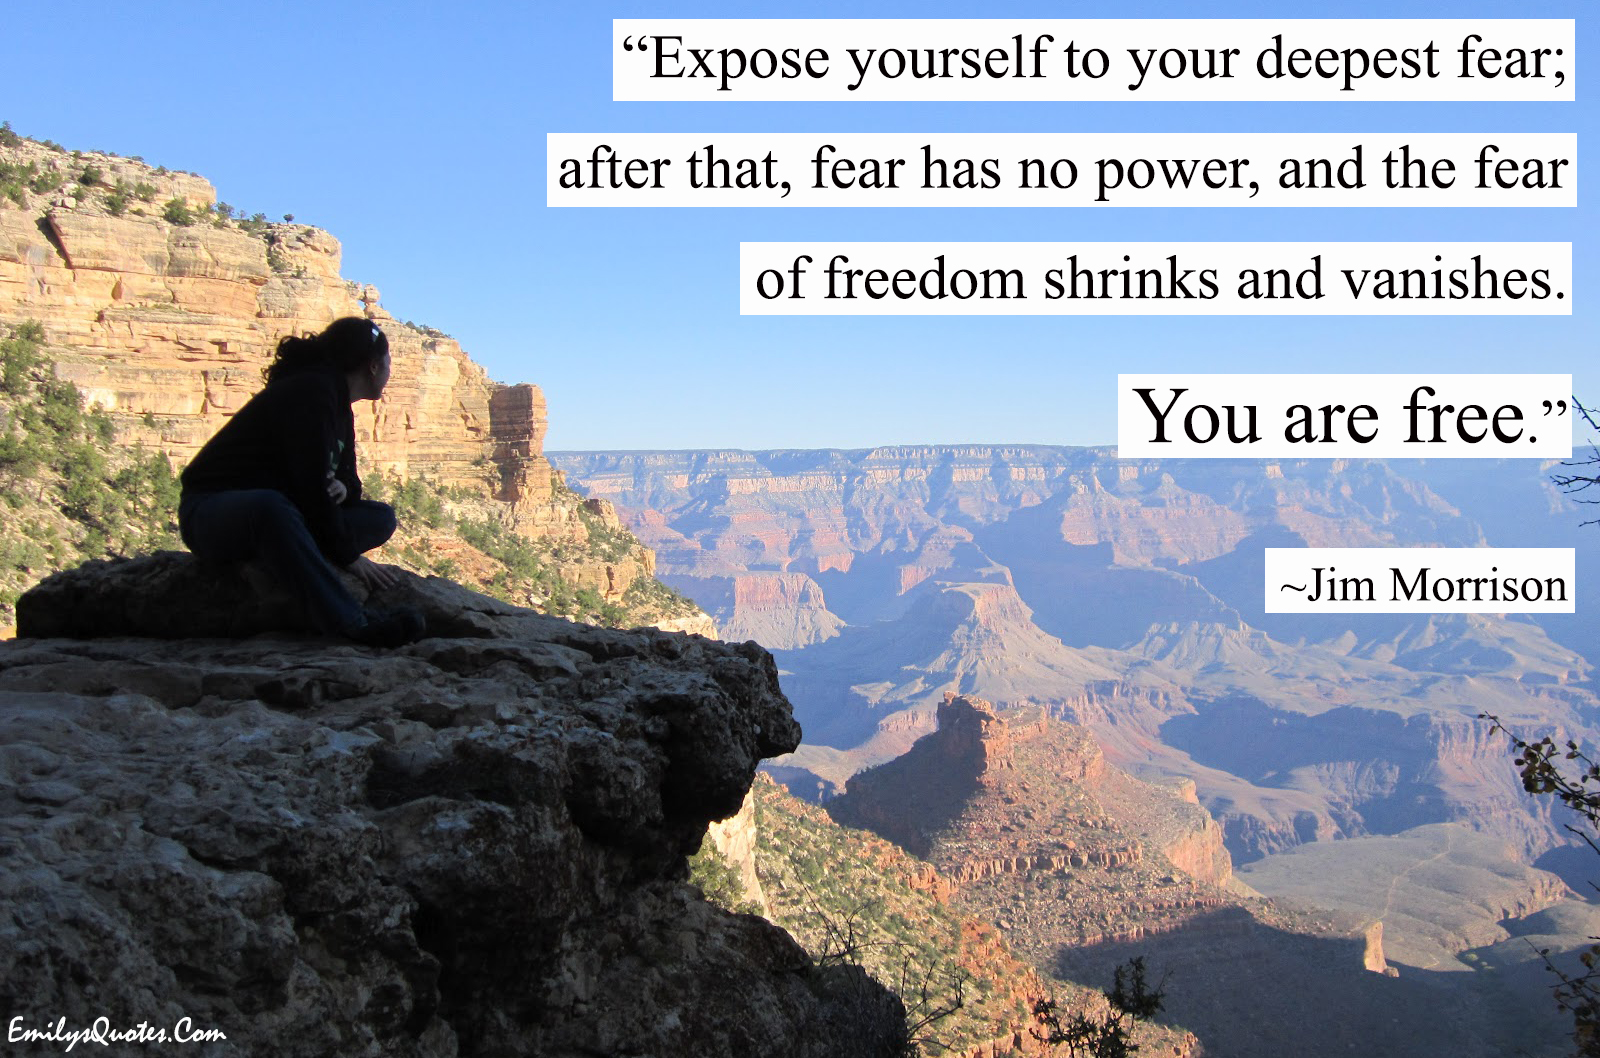 EmilysQuotes.Com - freedom, fear, wisdom, inspirational, courage, Jim Morrison